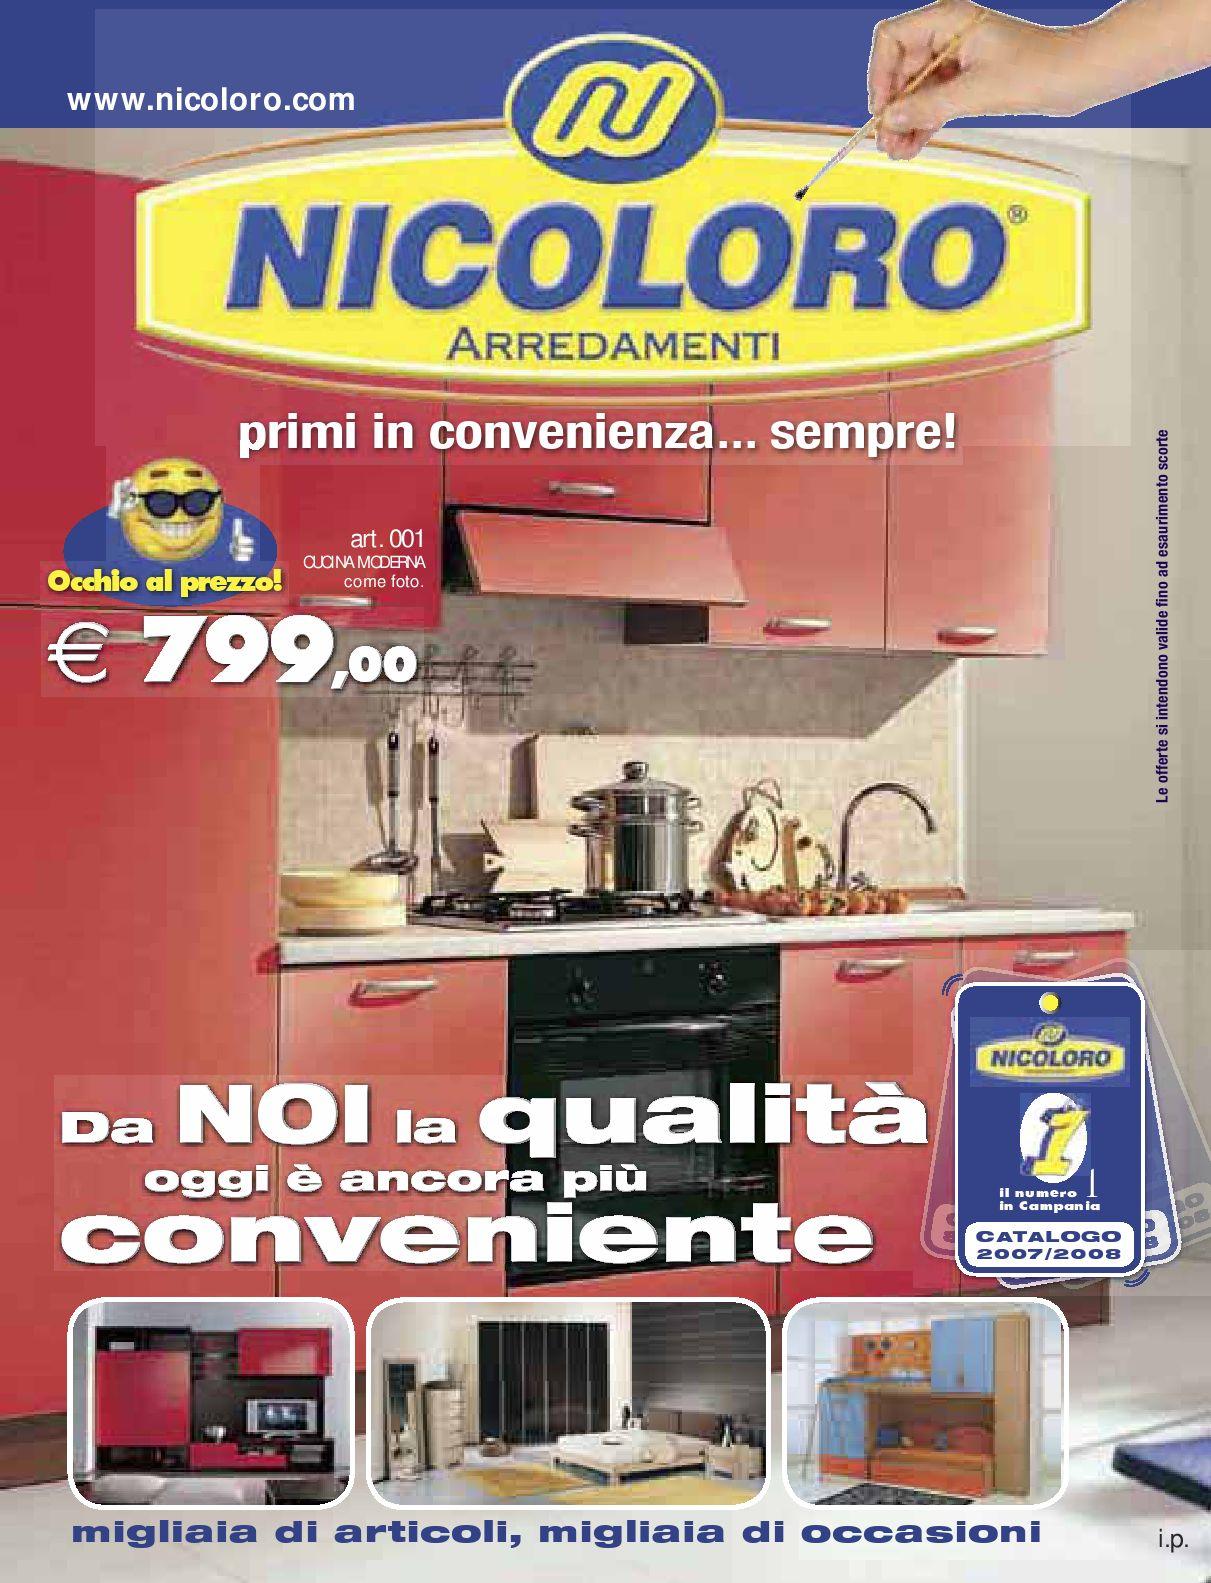 Nicoloro arredamenti by fernando ruocco issuu for Nicoloro arredamenti scafati